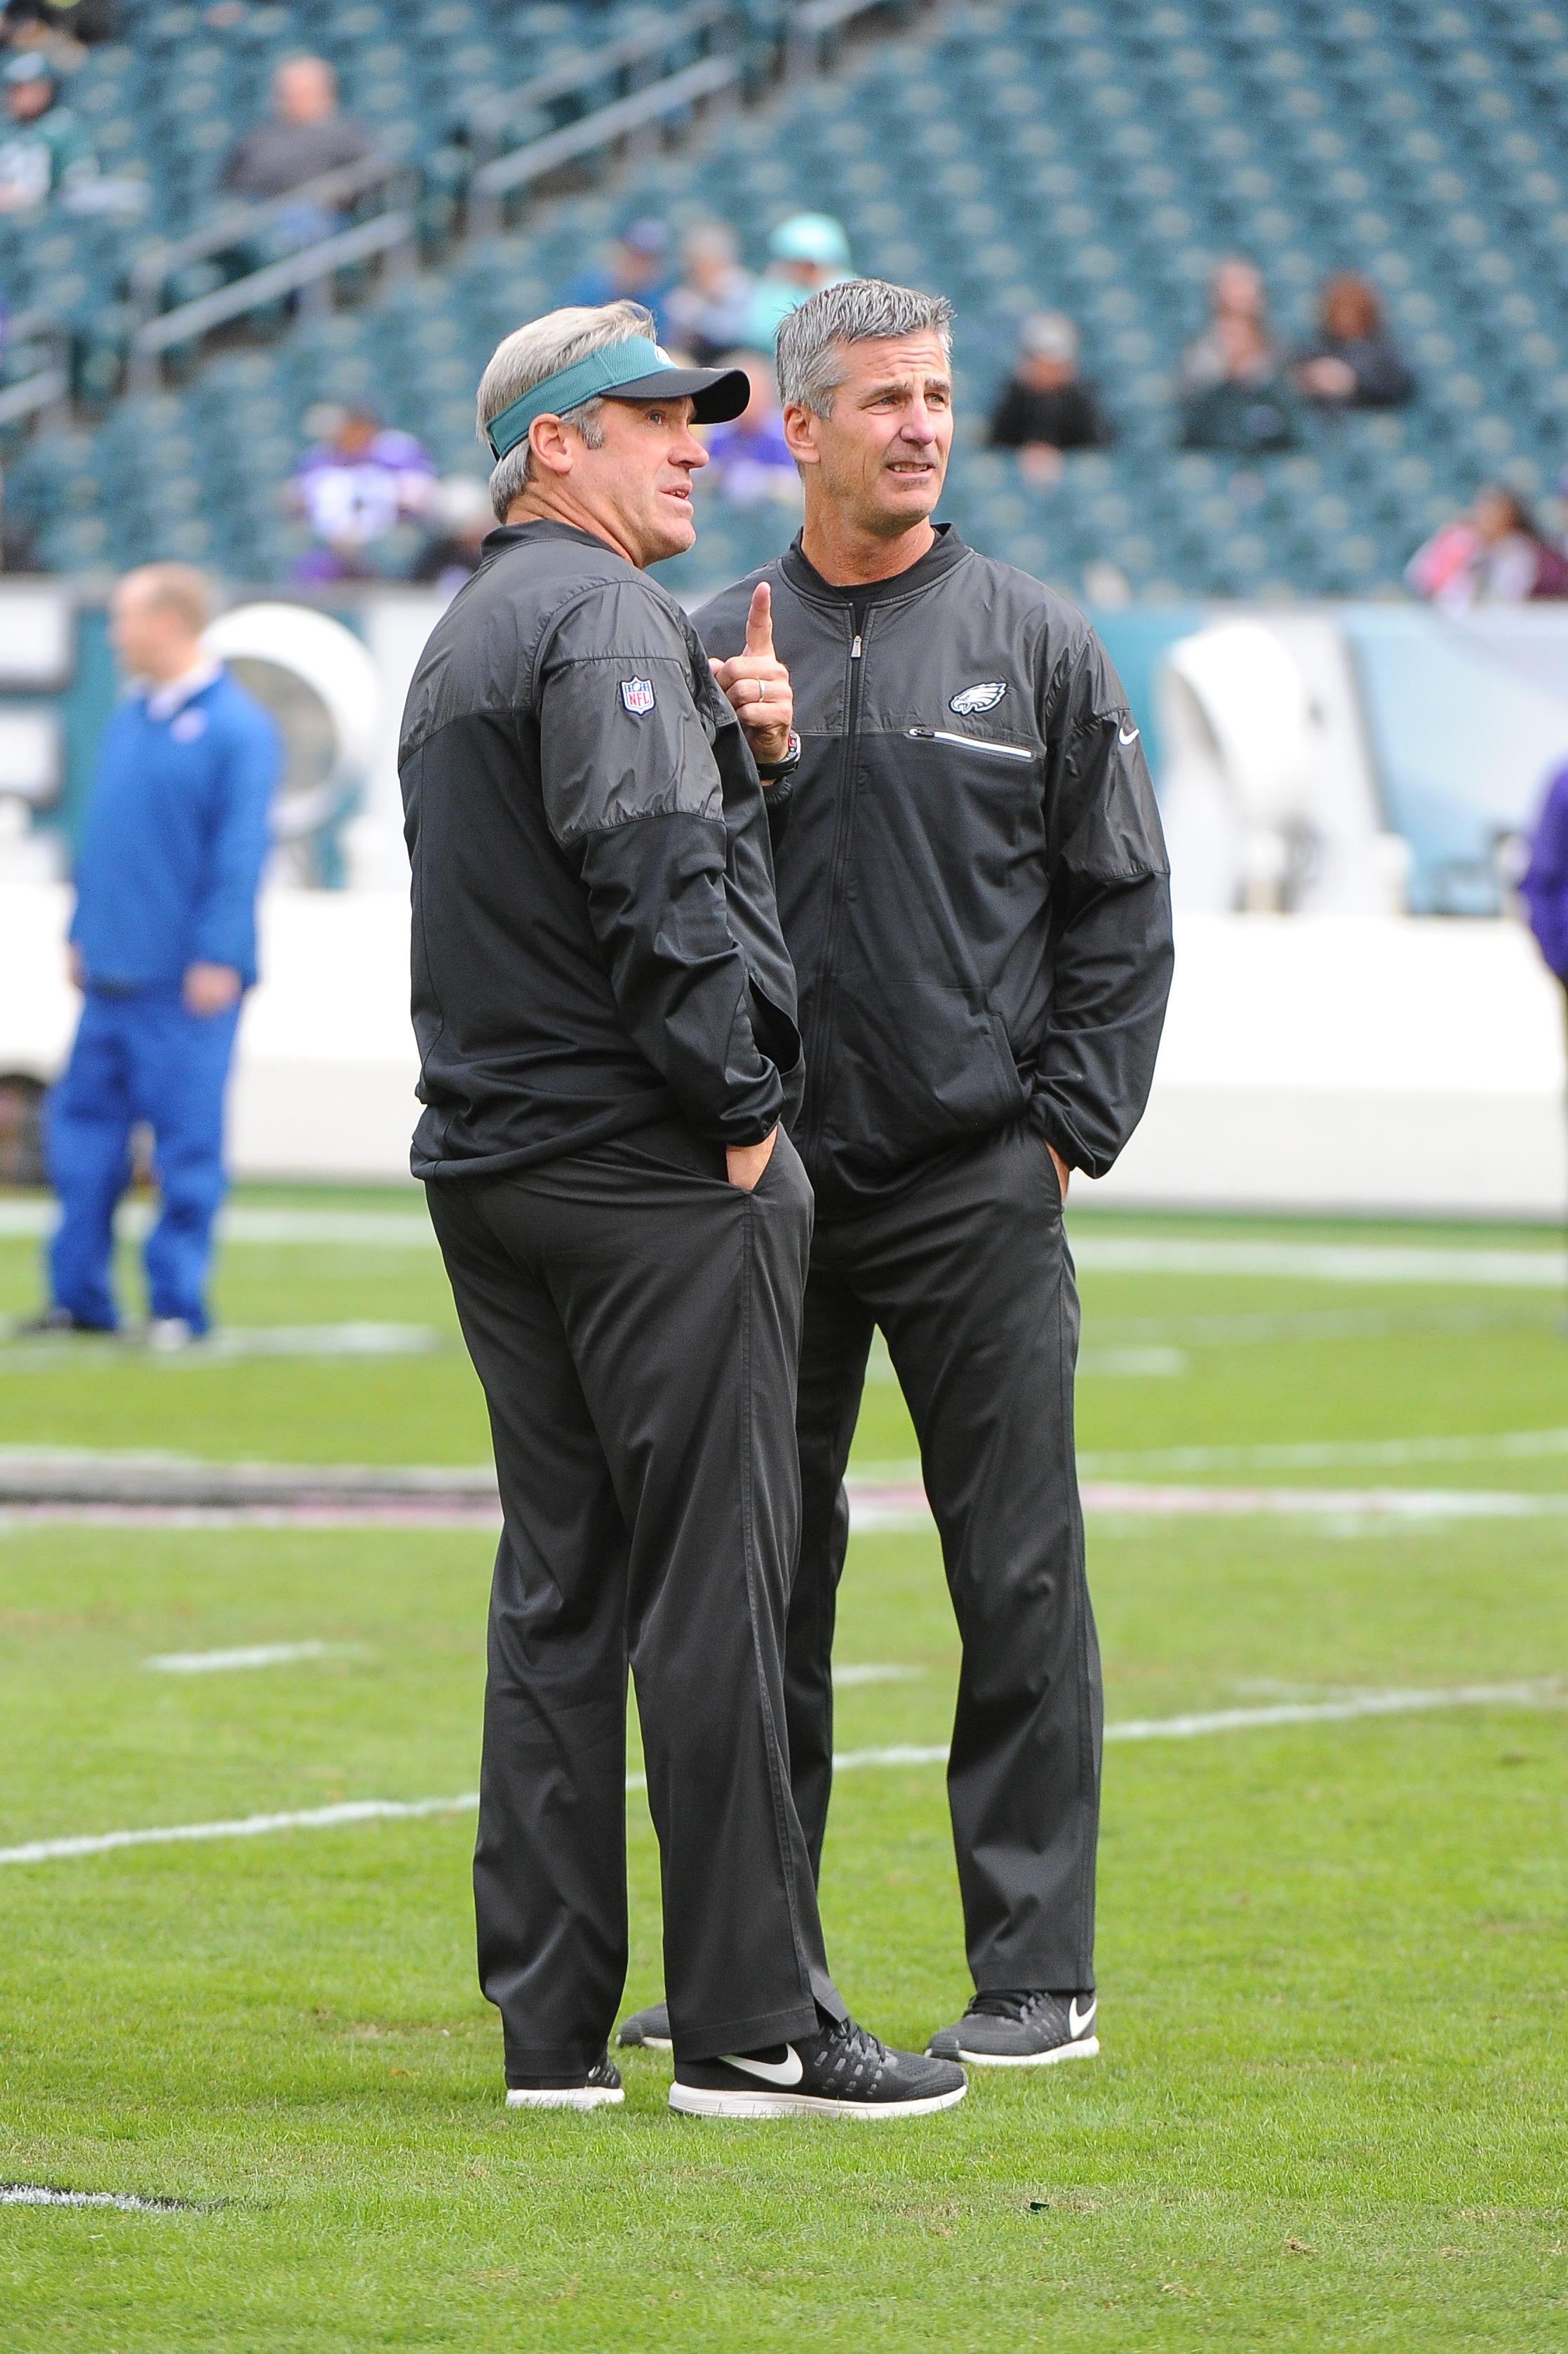 NFL: OCT 23 Vikings at Eagles